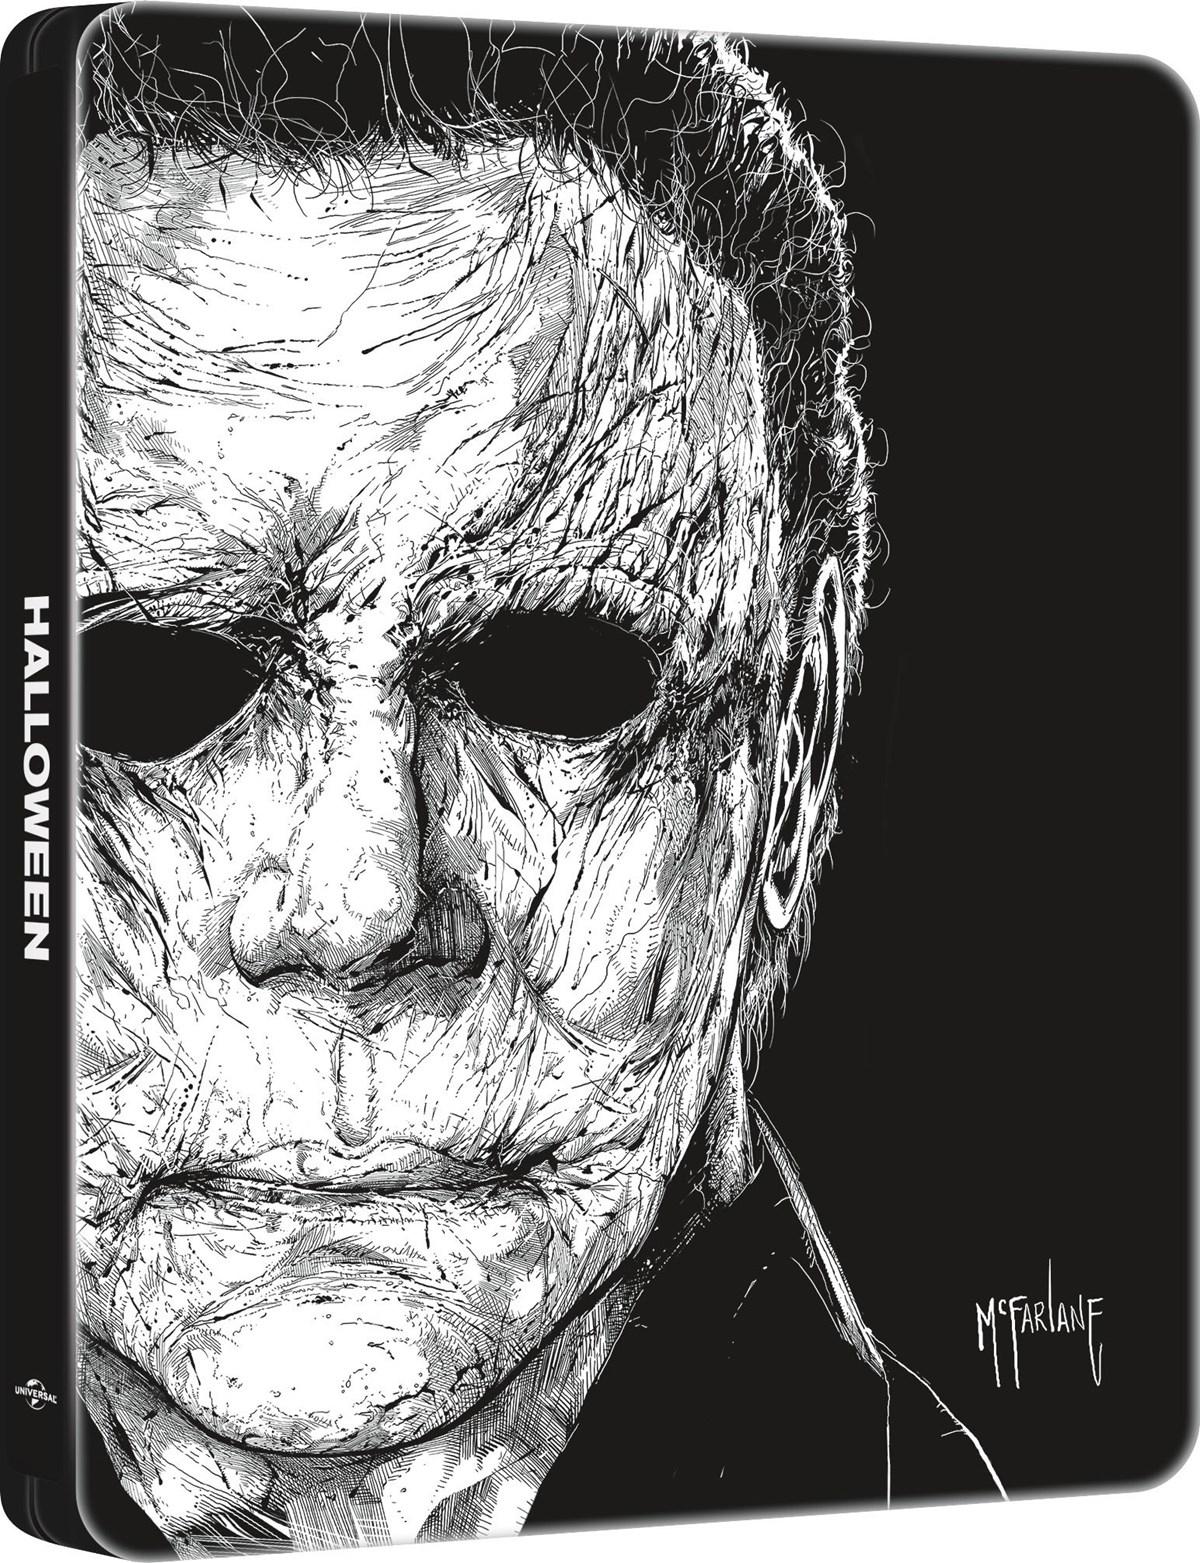 Halloween Limited Edition Steelbook (4K Ultra HD + Blu-ray) [UHD] £14.99 / £13.49 with code @ Zoom